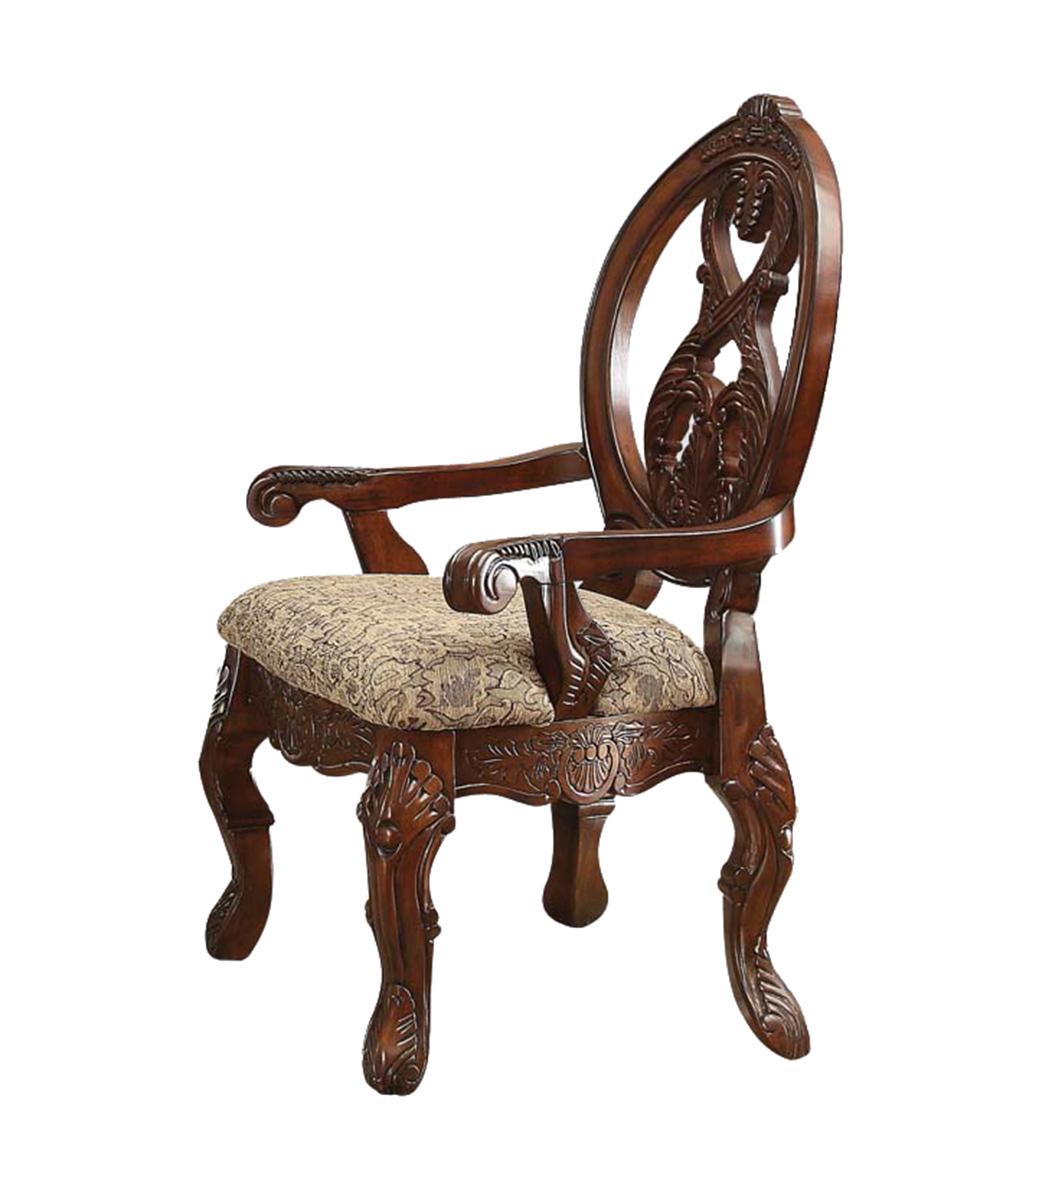 Acme Rovledo Arm Chair - Fabric/Cherry